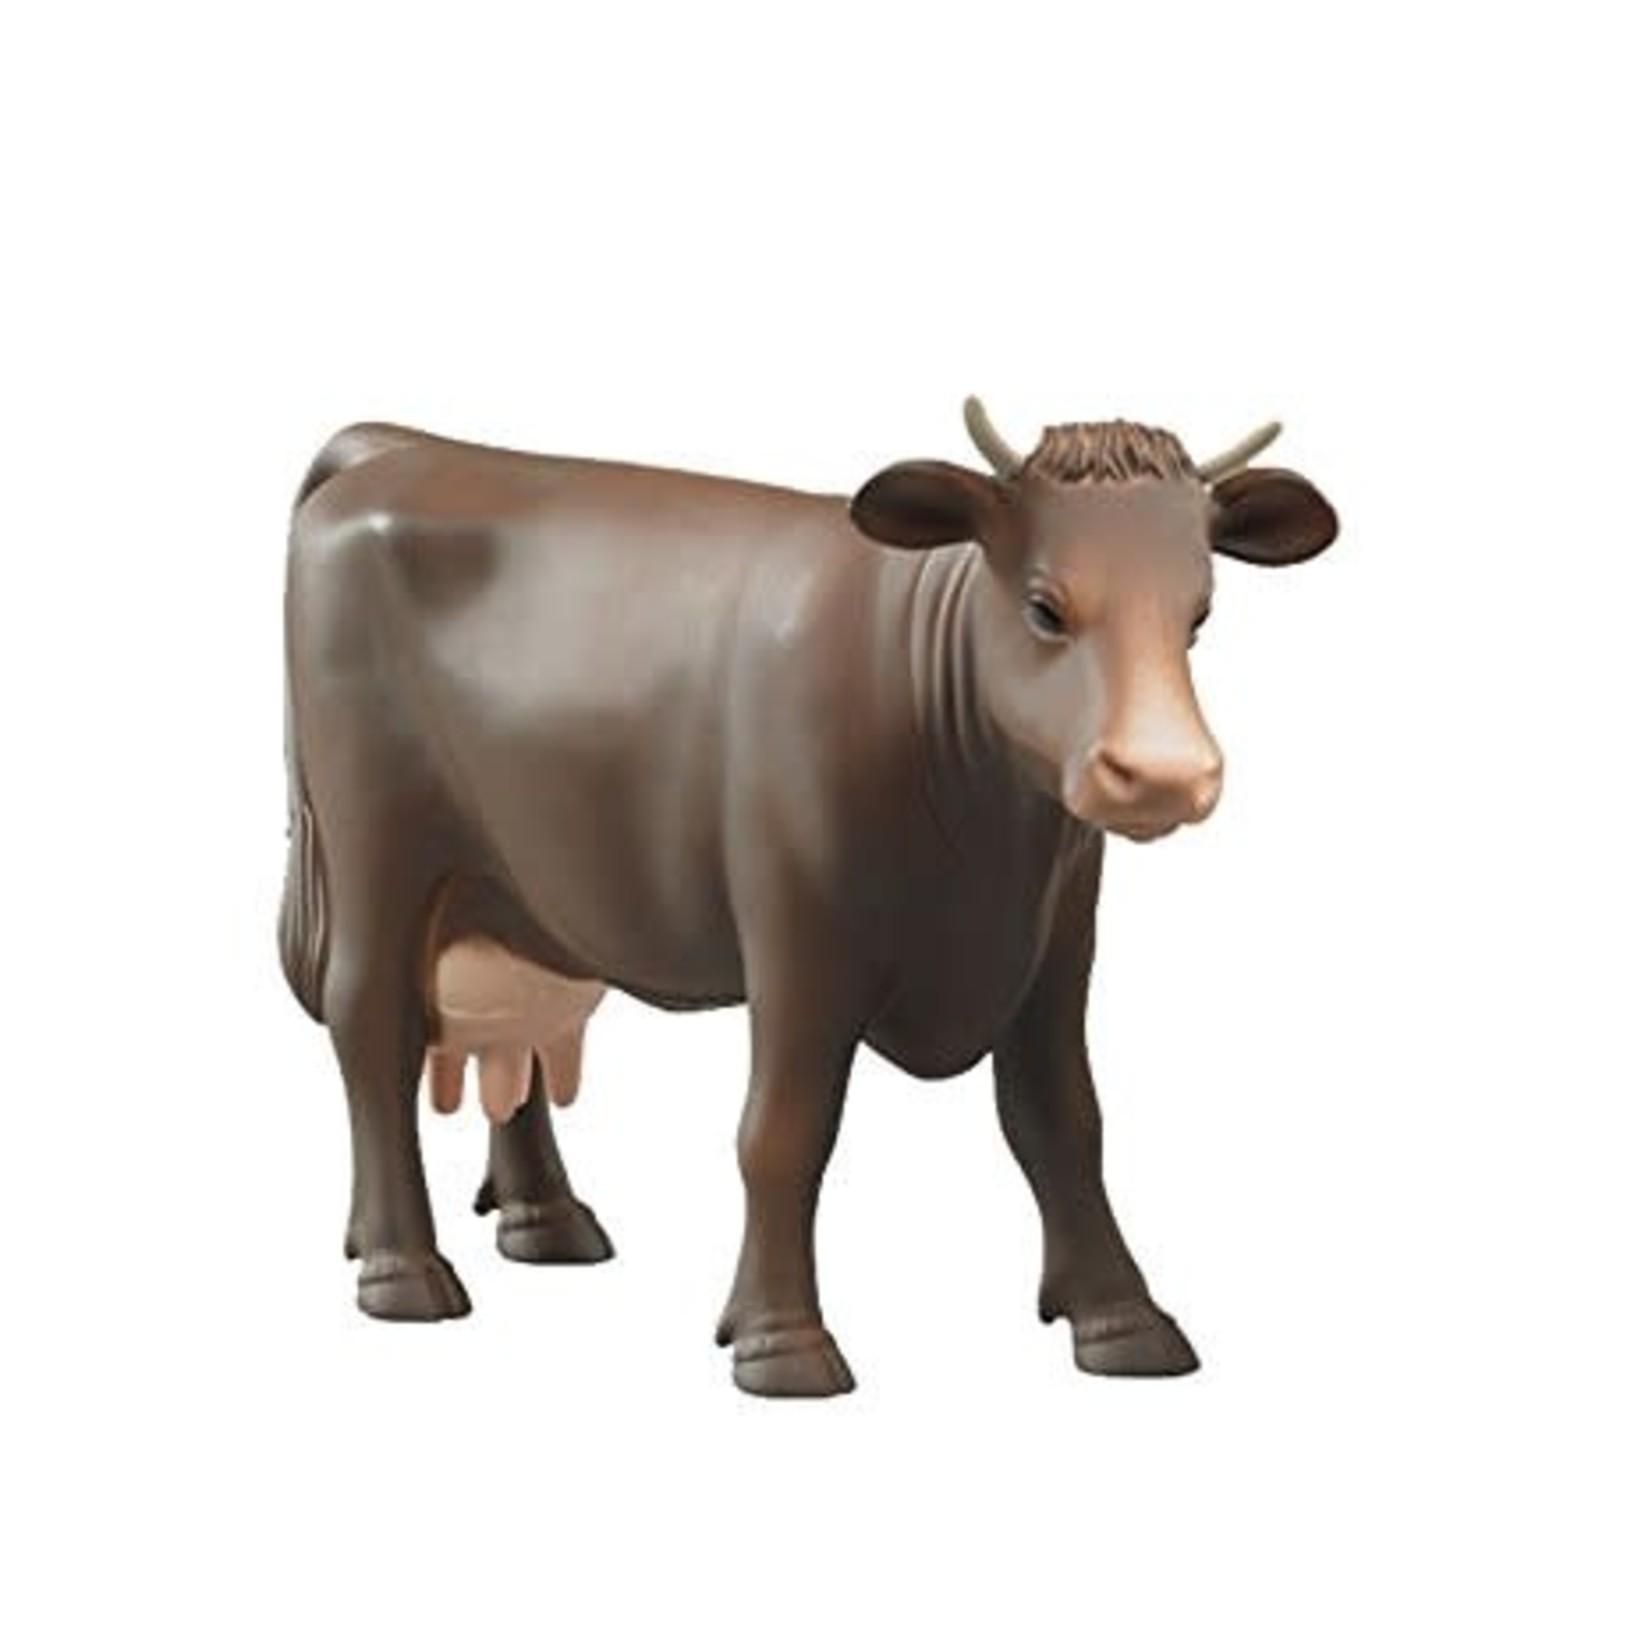 Bruder BRUDER FARM ANIMAL COW